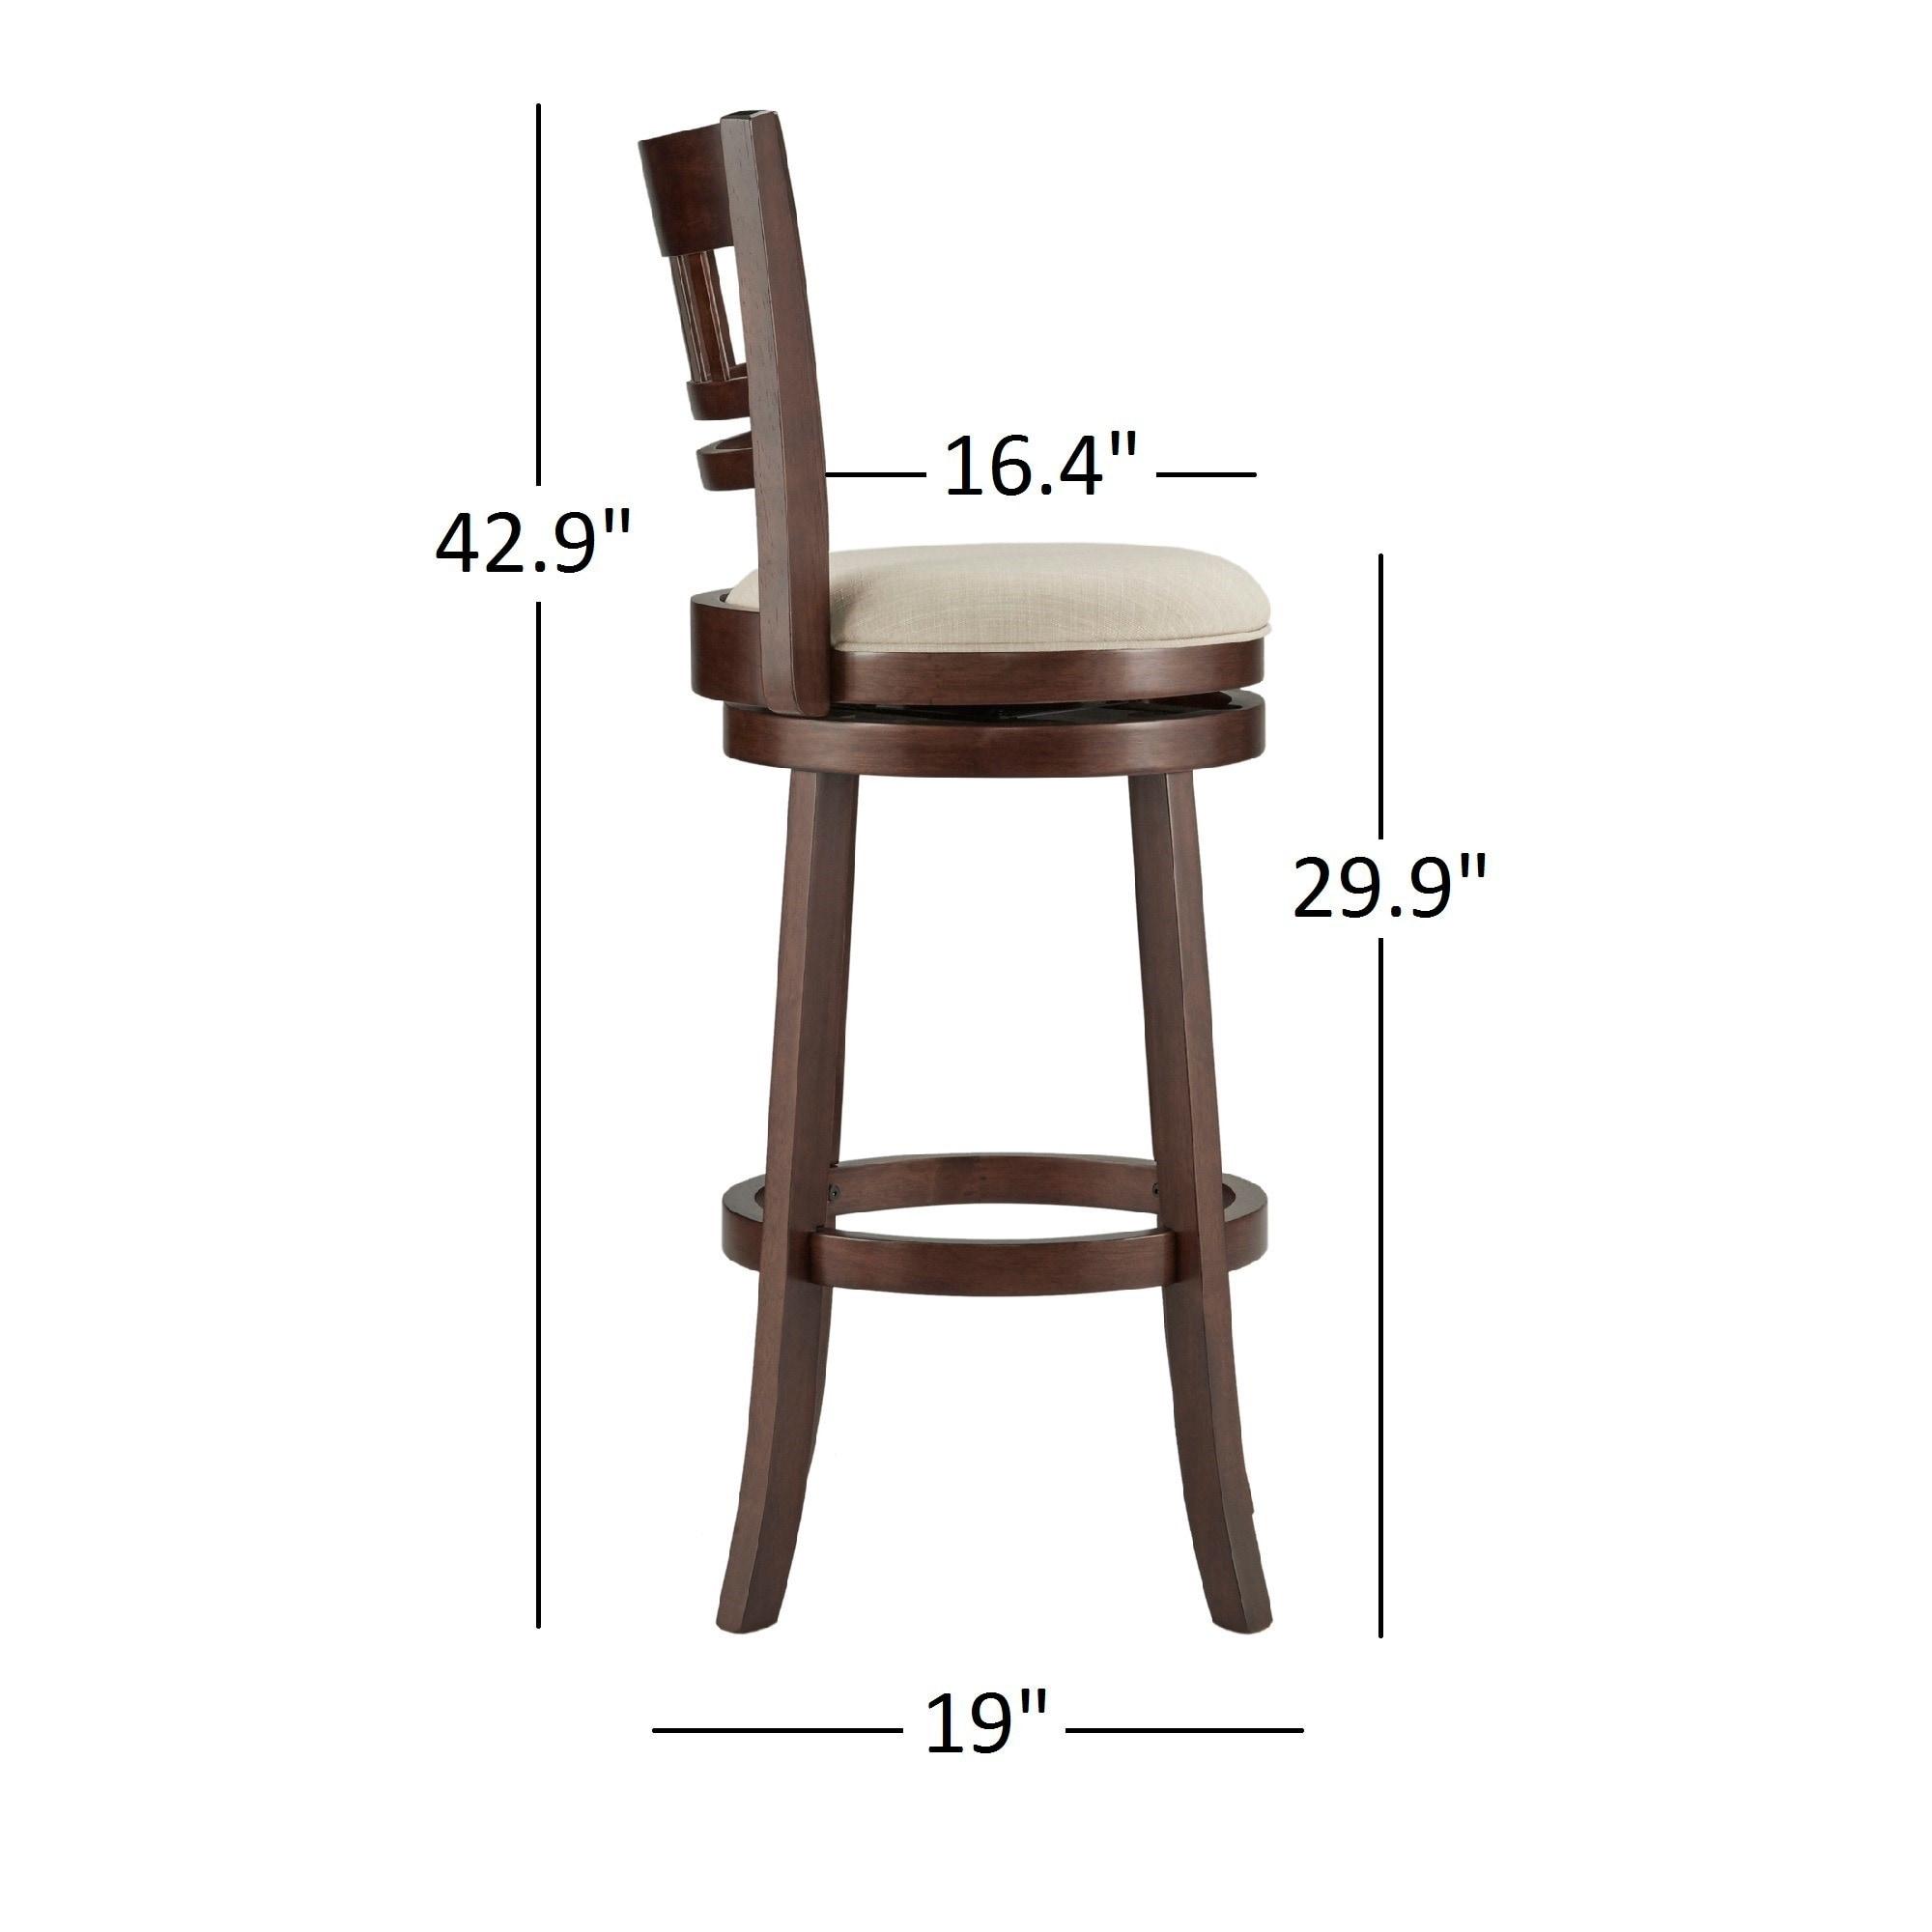 Wondrous Verona Swivel 29 Inch High Back Bar Stool By Inspire Q Classic Dailytribune Chair Design For Home Dailytribuneorg